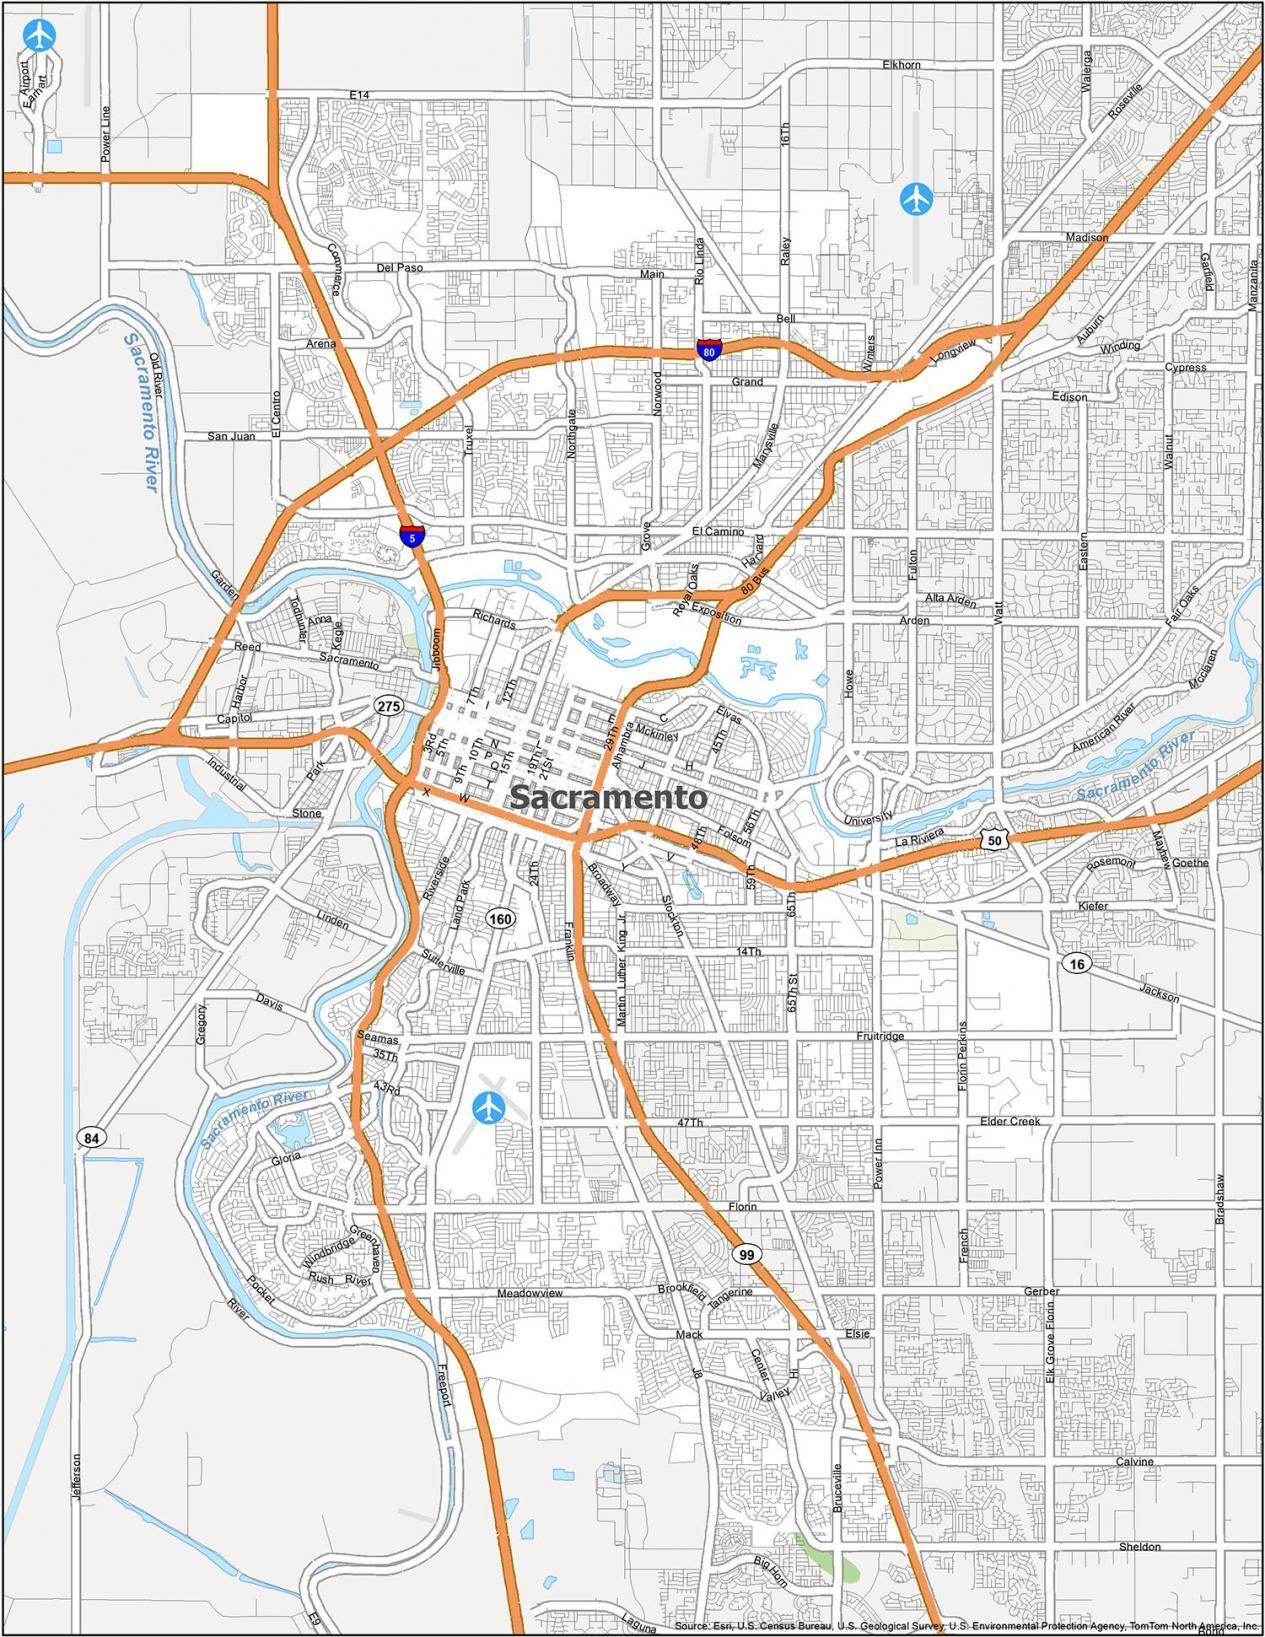 Sacramento Road Map